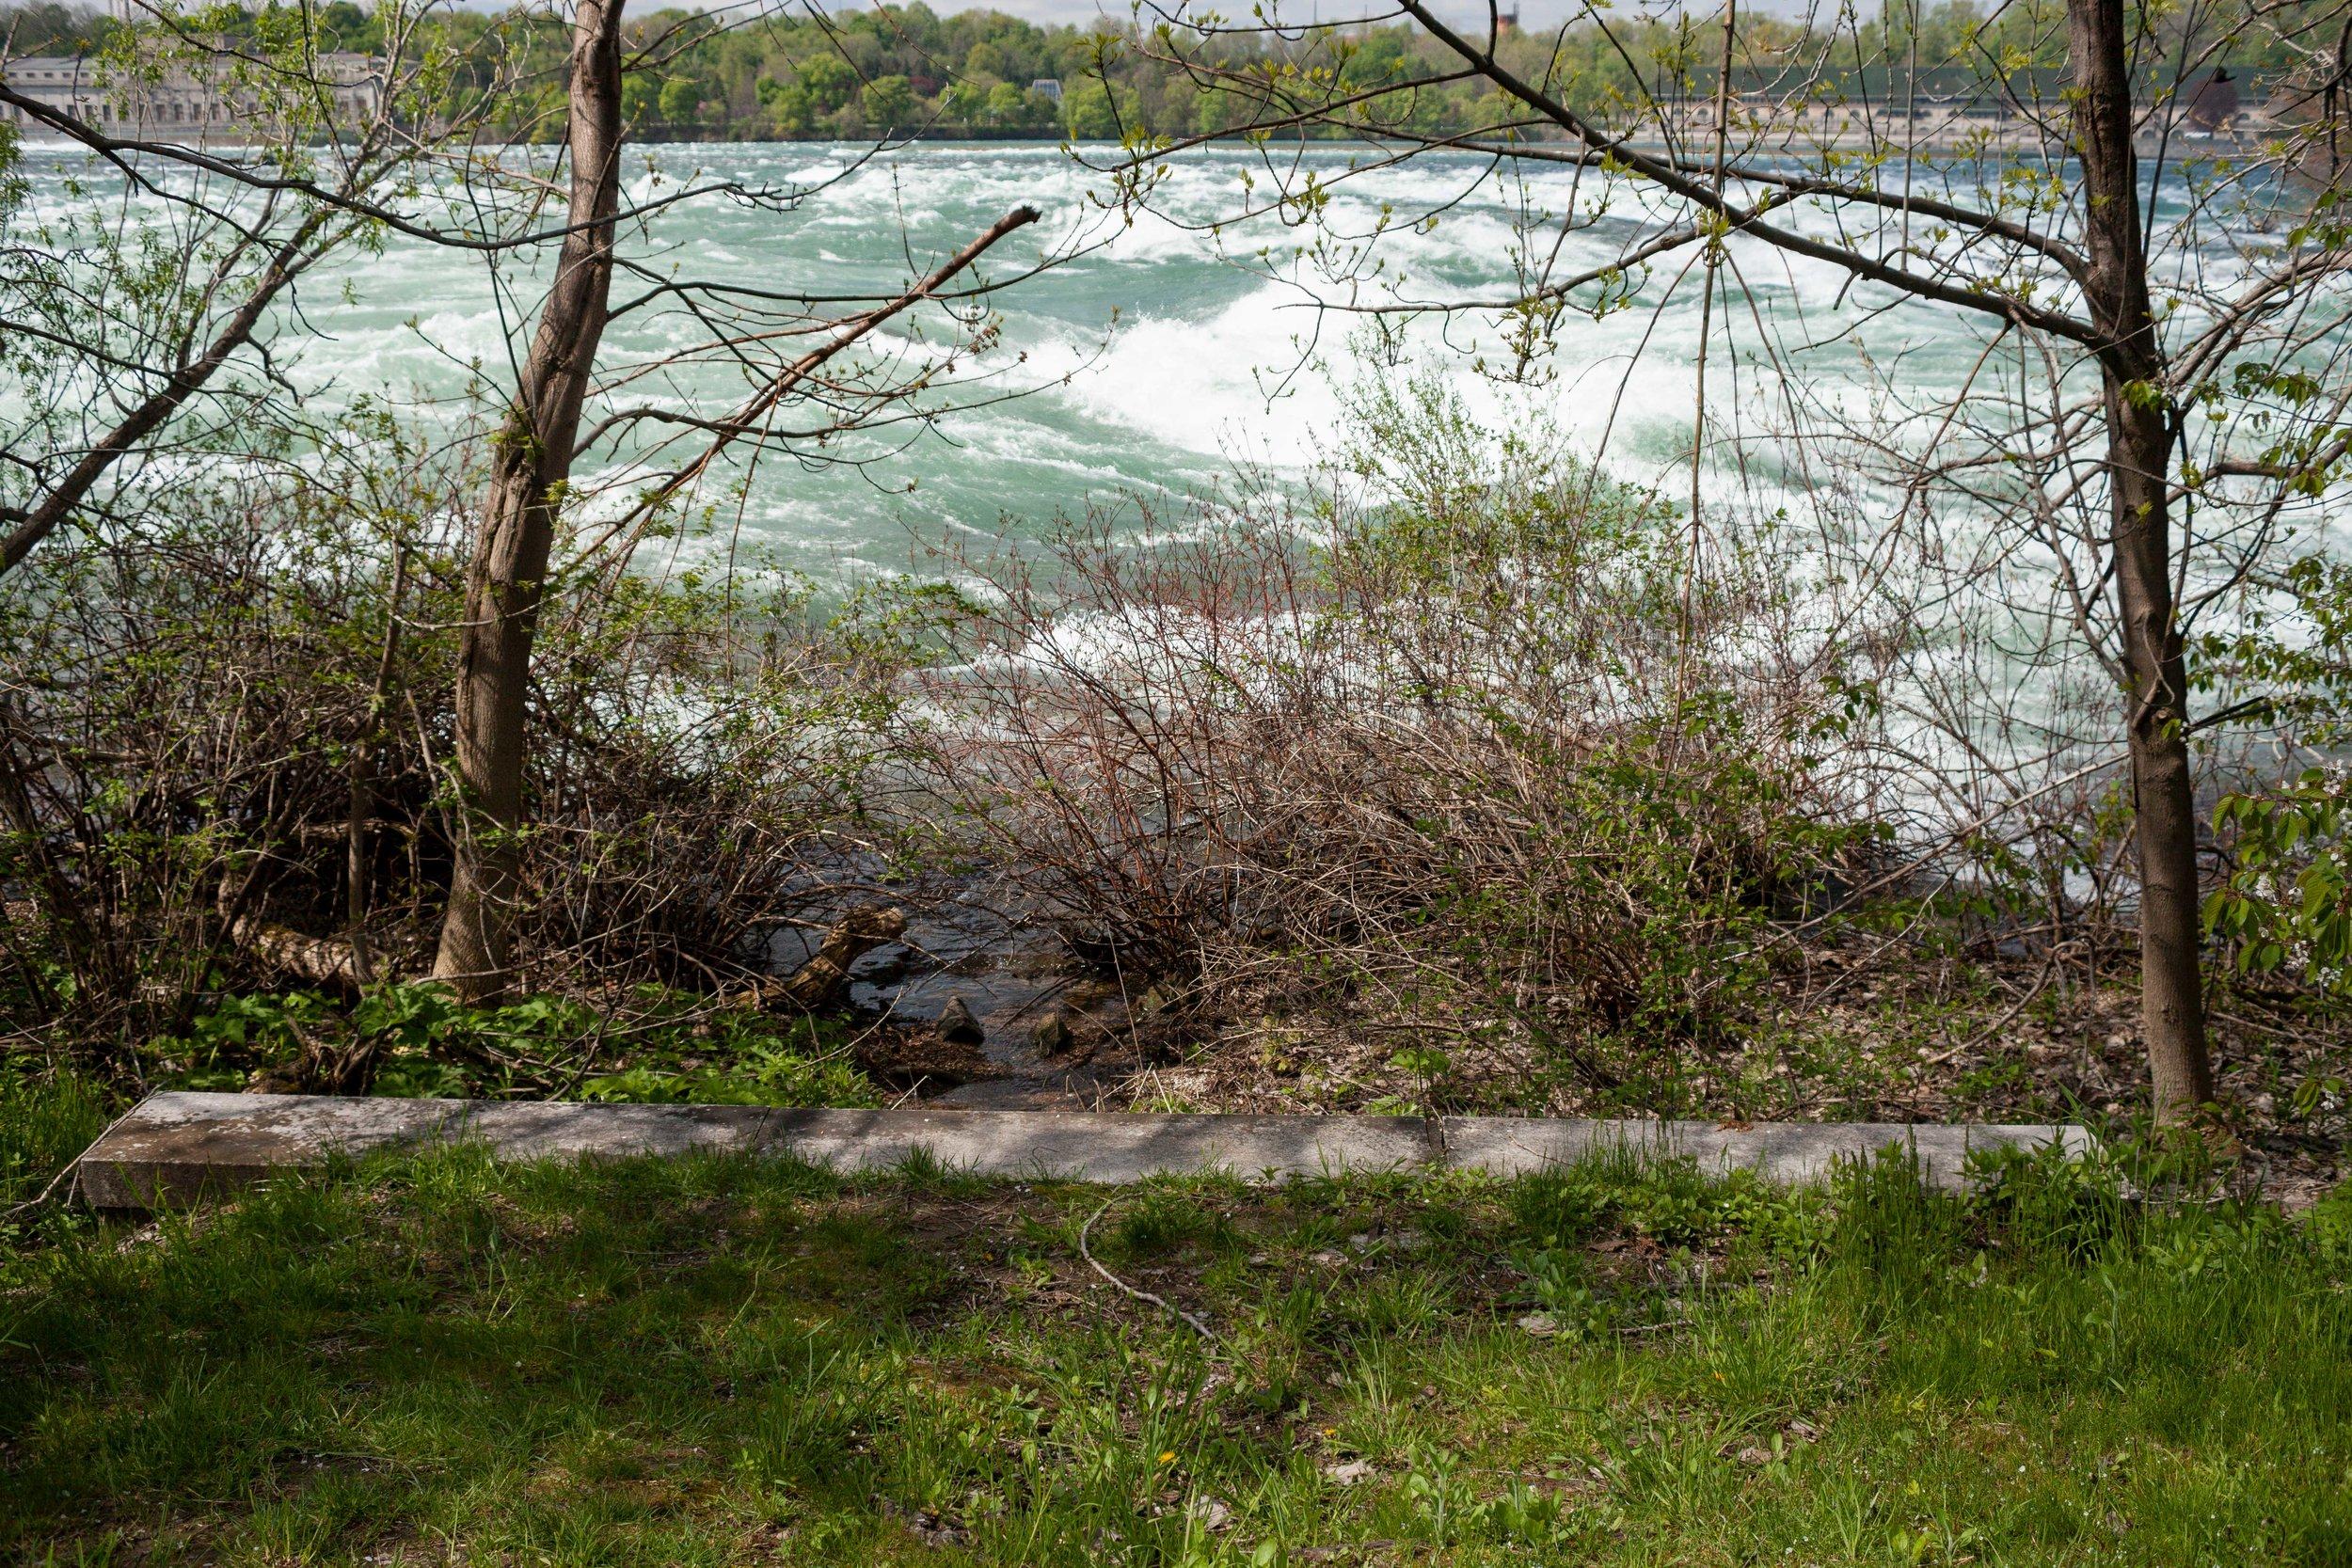 Rapids above Falls, Niagara Falls, NY